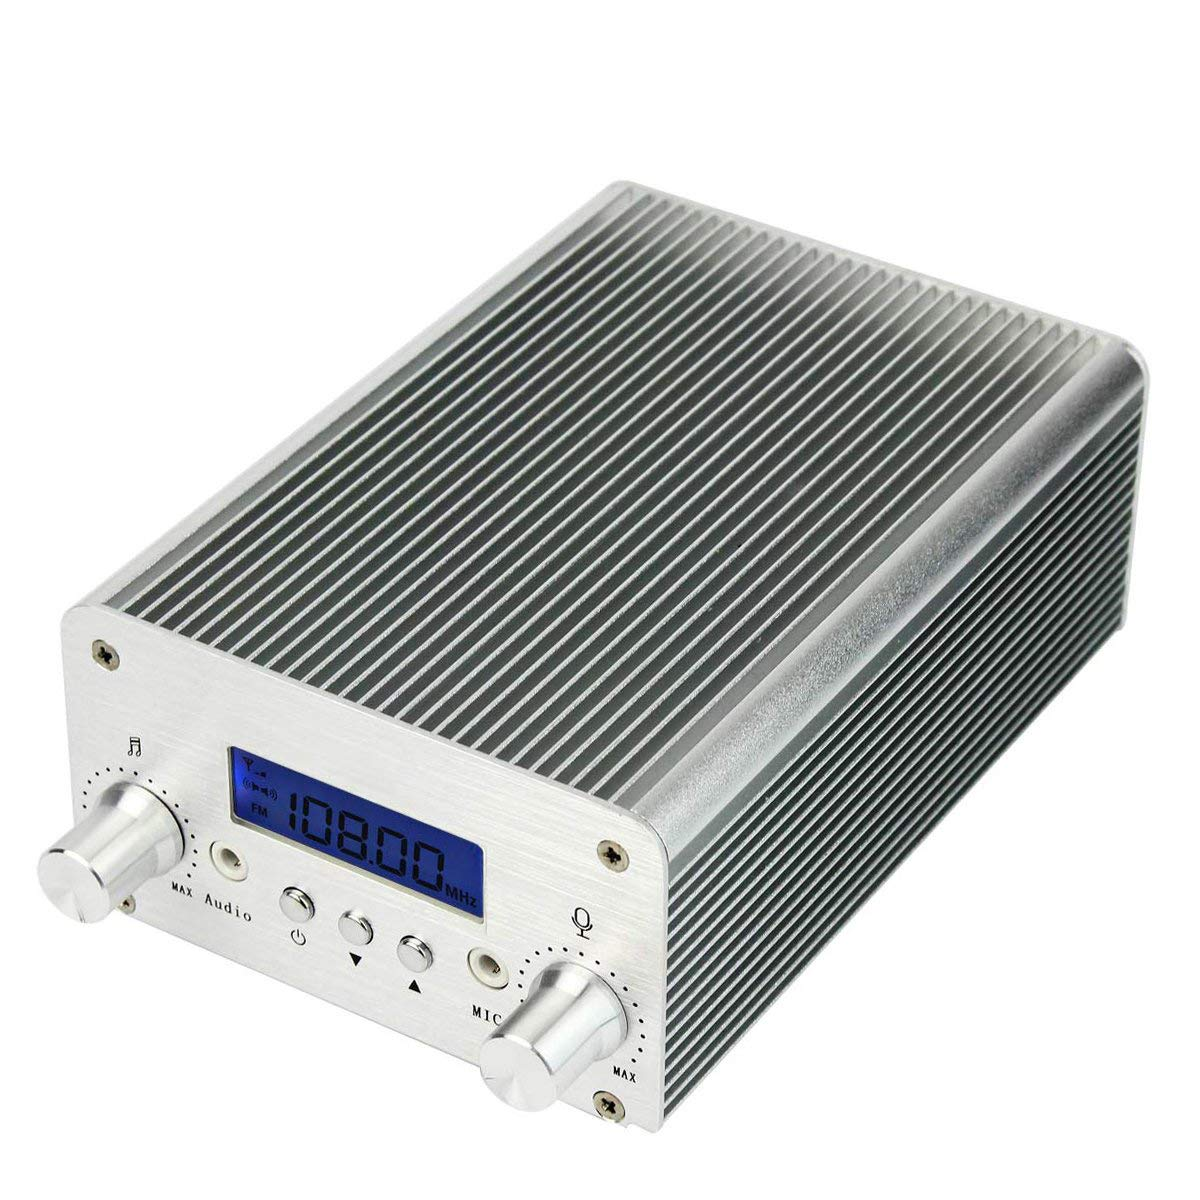 Retekess T15b 5w 15w Fm Transmitter Long Range Wireless 8w Pll Stereo With Lcd Mini Radio Broadcast Station Music Display Aux In Line